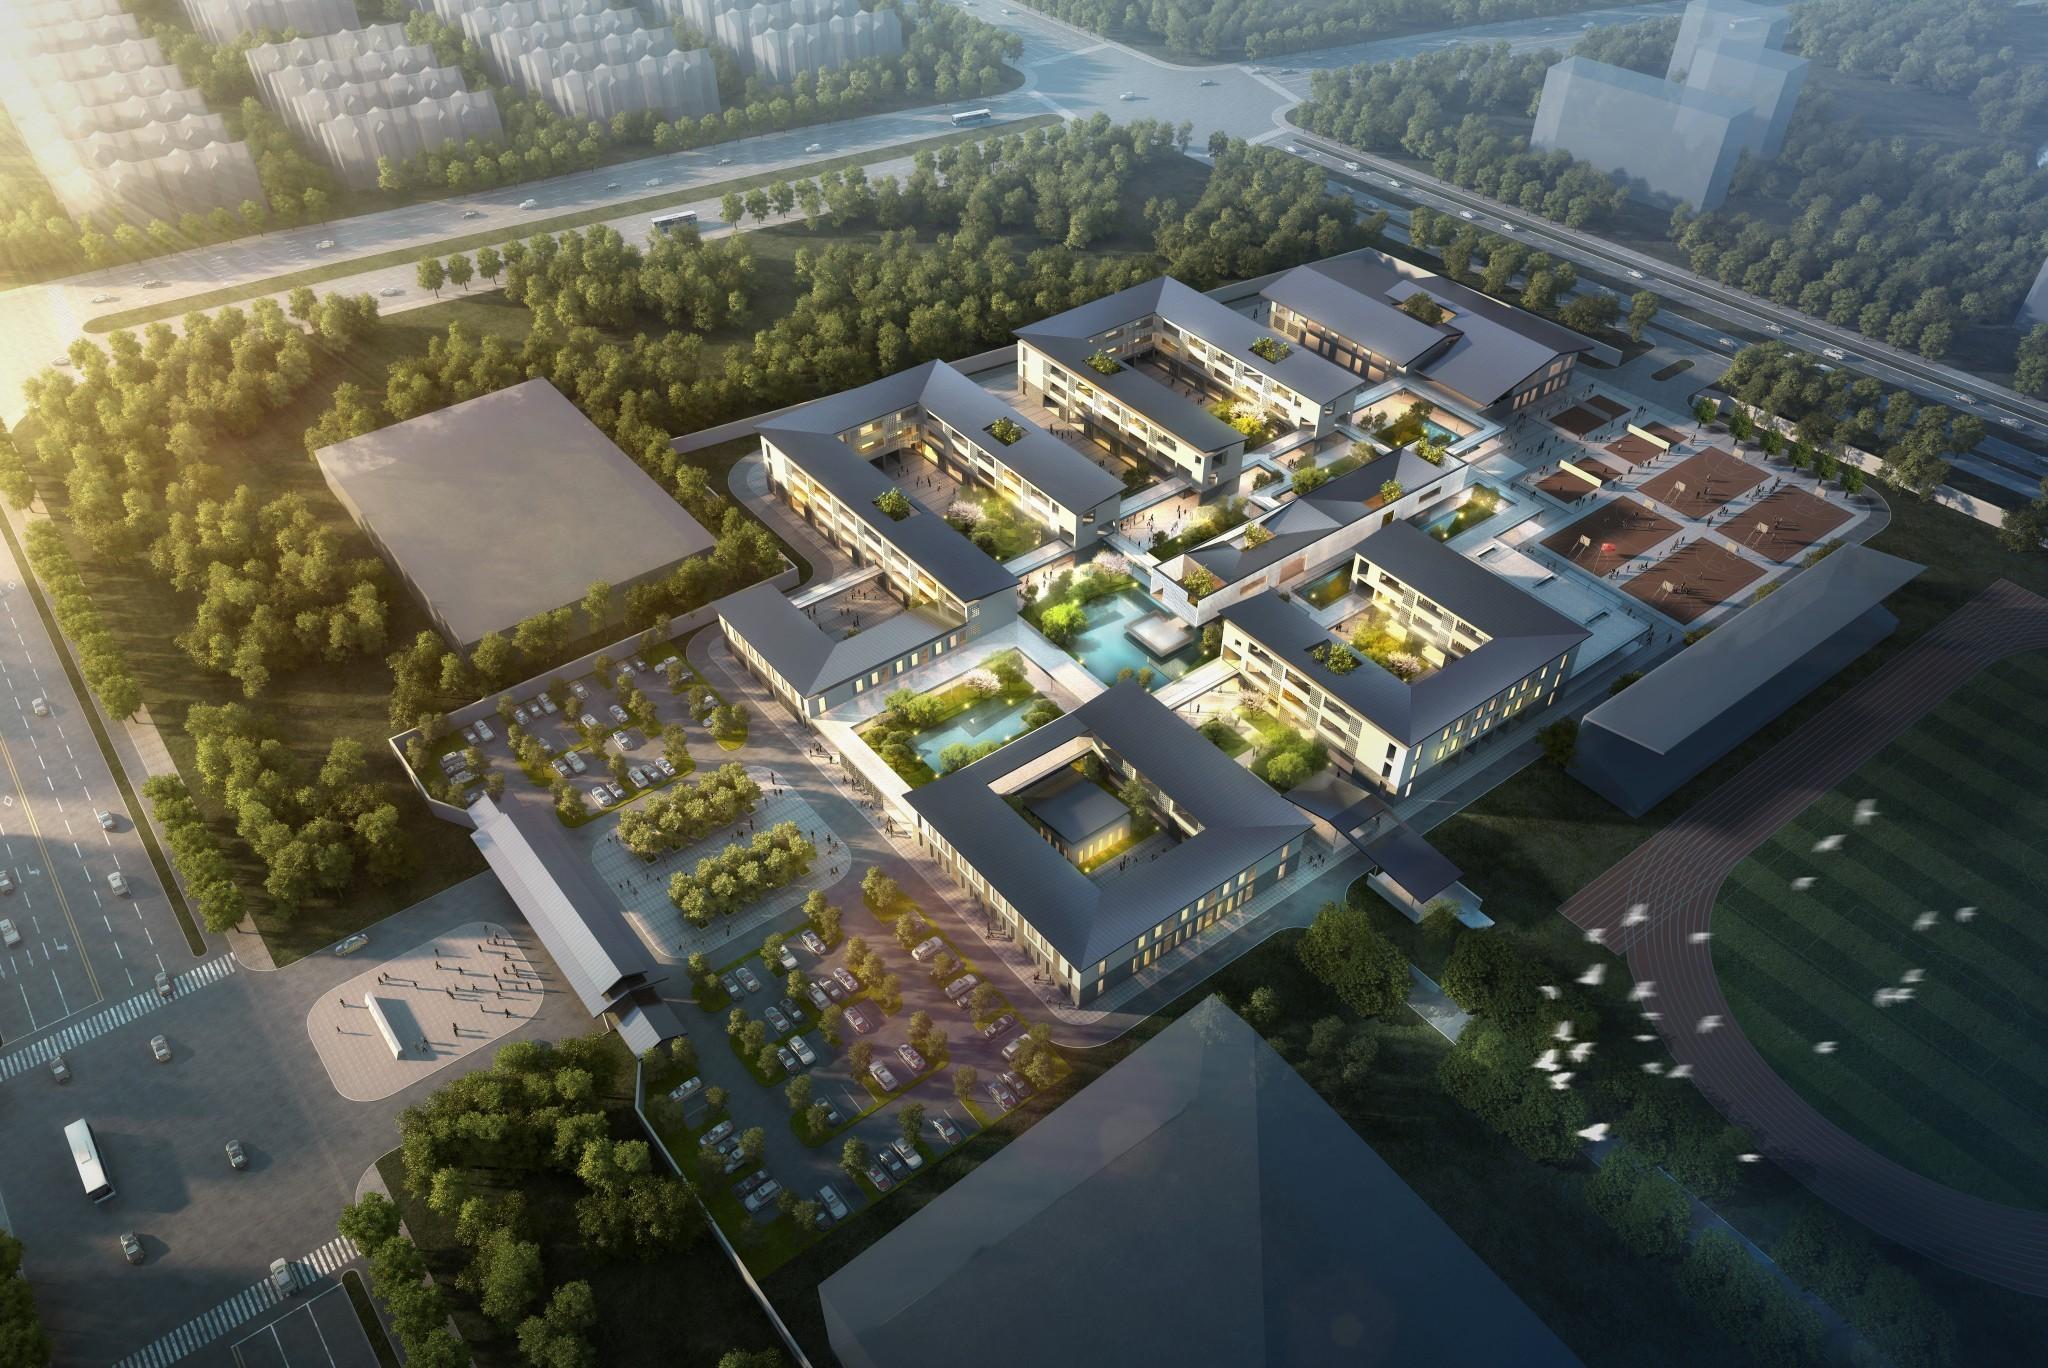 D1509-49(学校)大正建筑工作室-吴江中学-c02-wyb-1